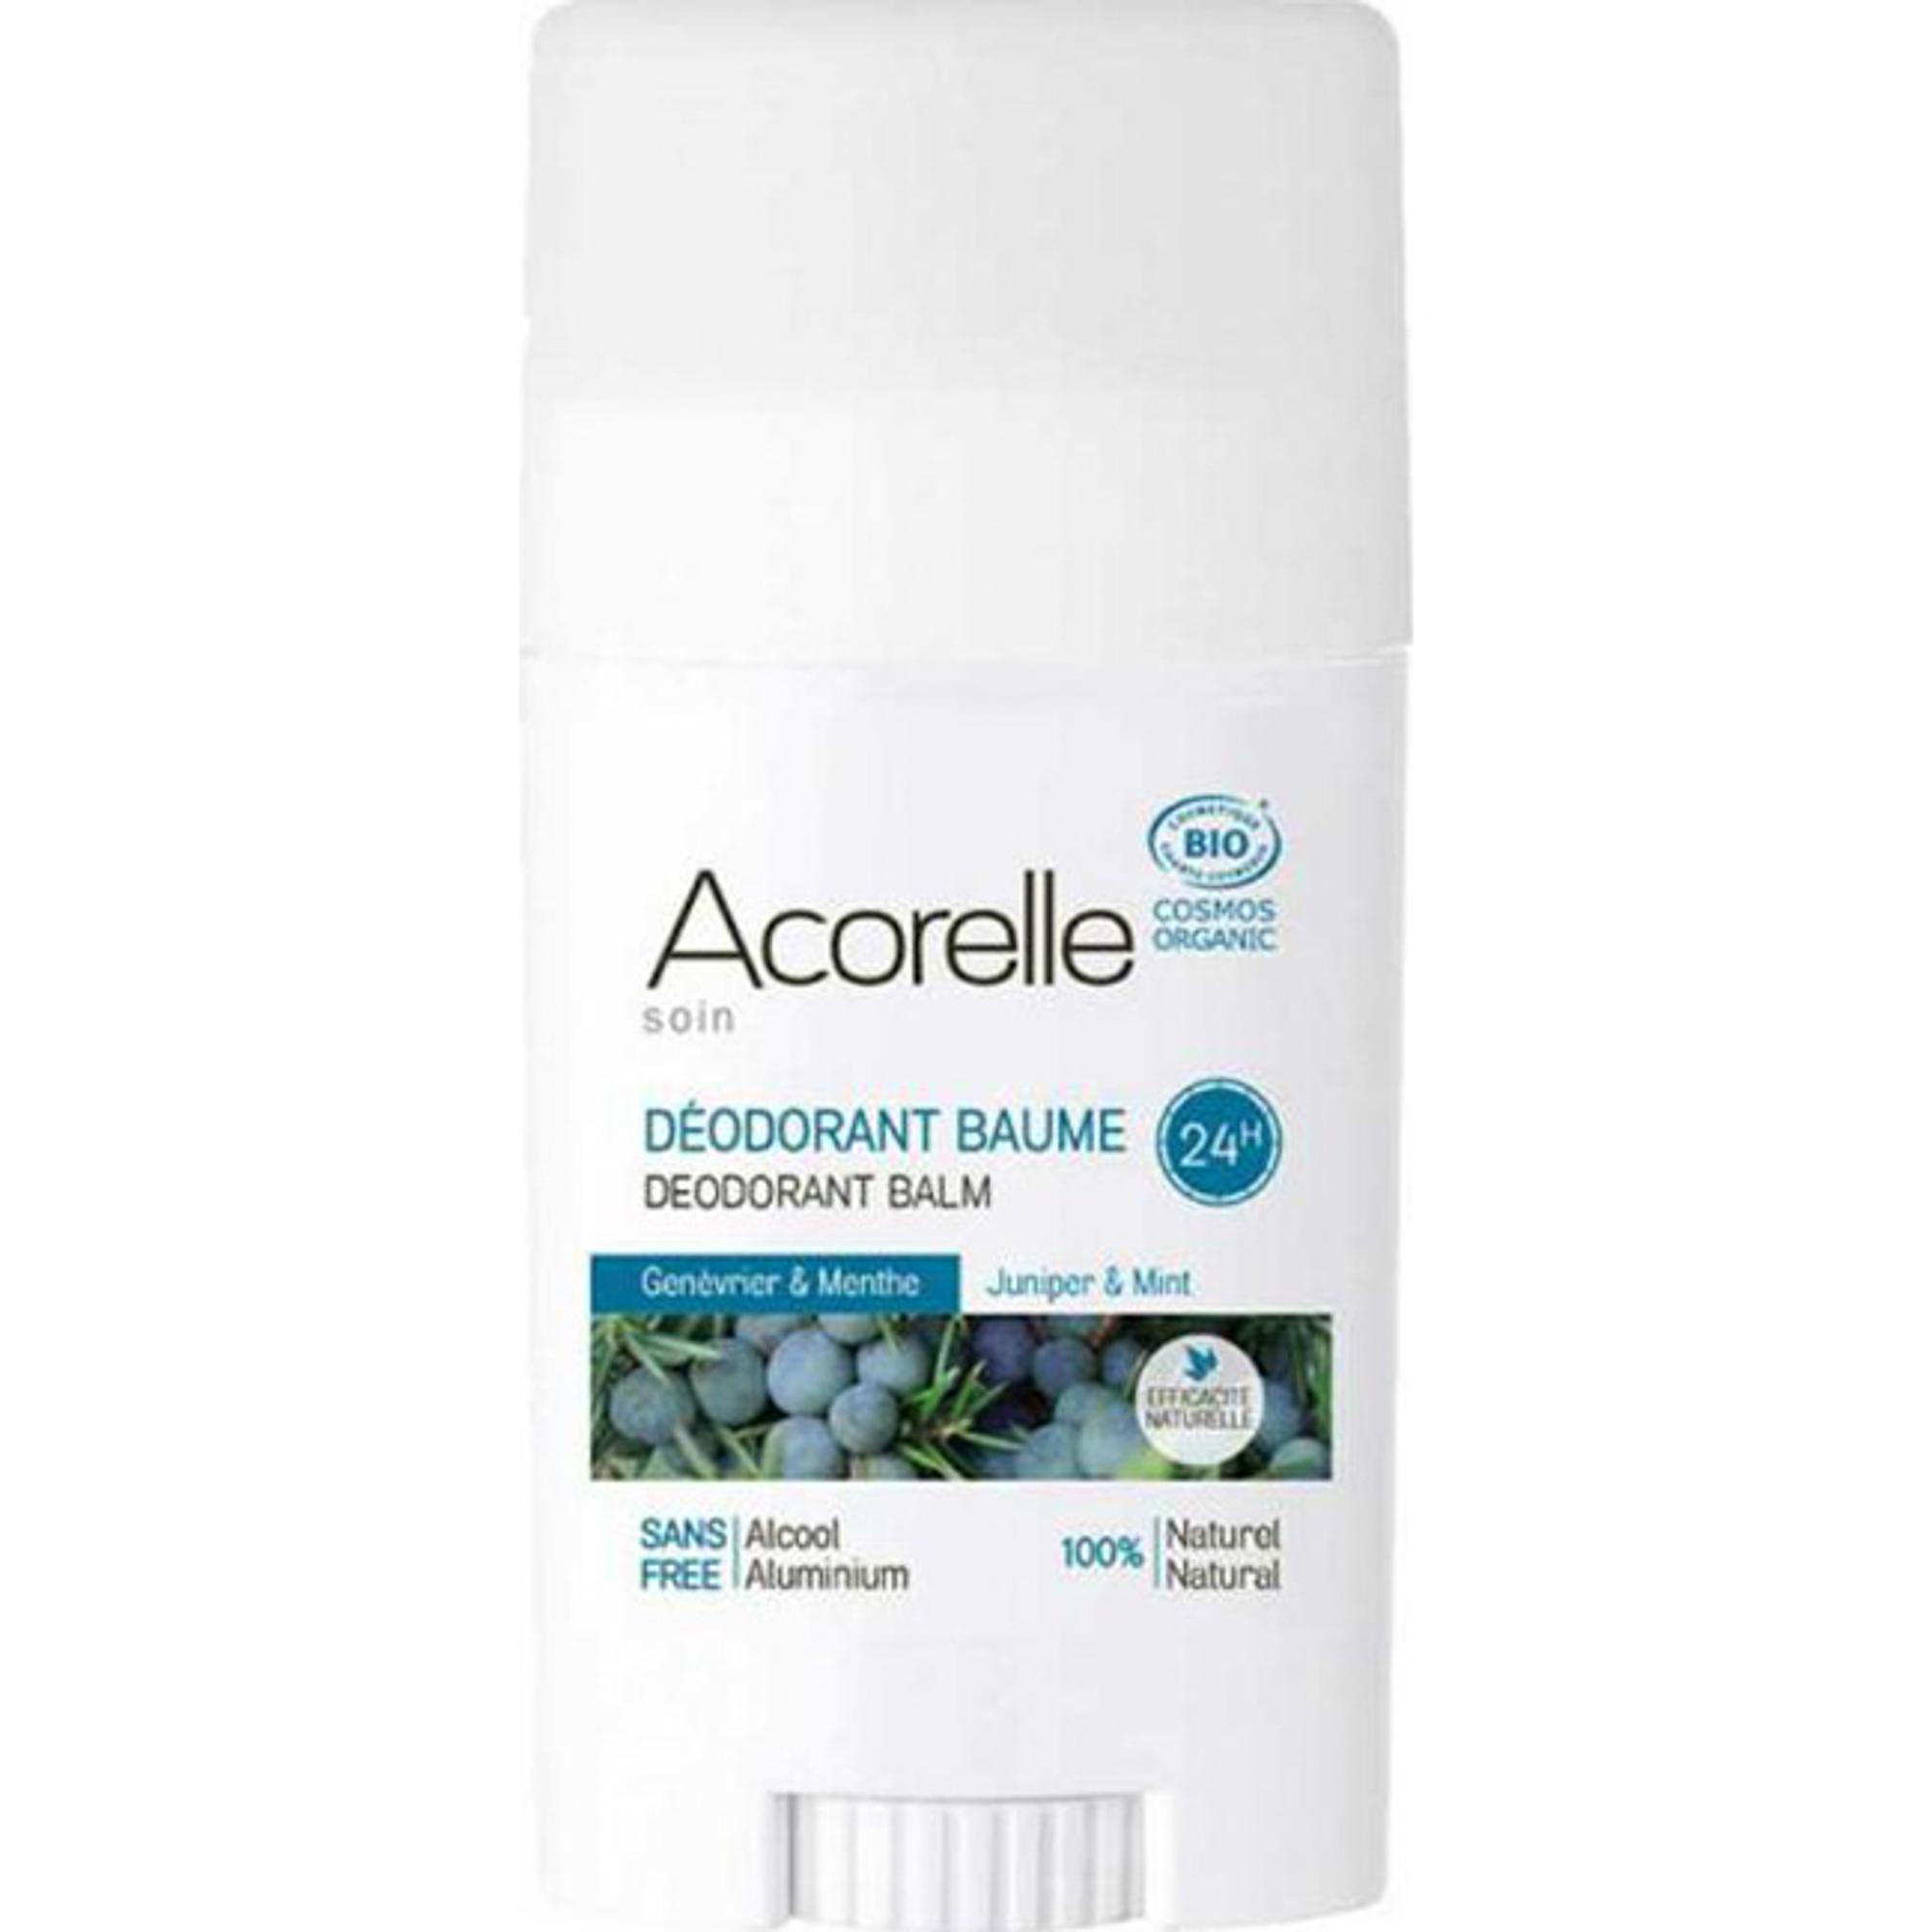 Дезодорант Acorelle Можжевельник & Мята 40 мл фото